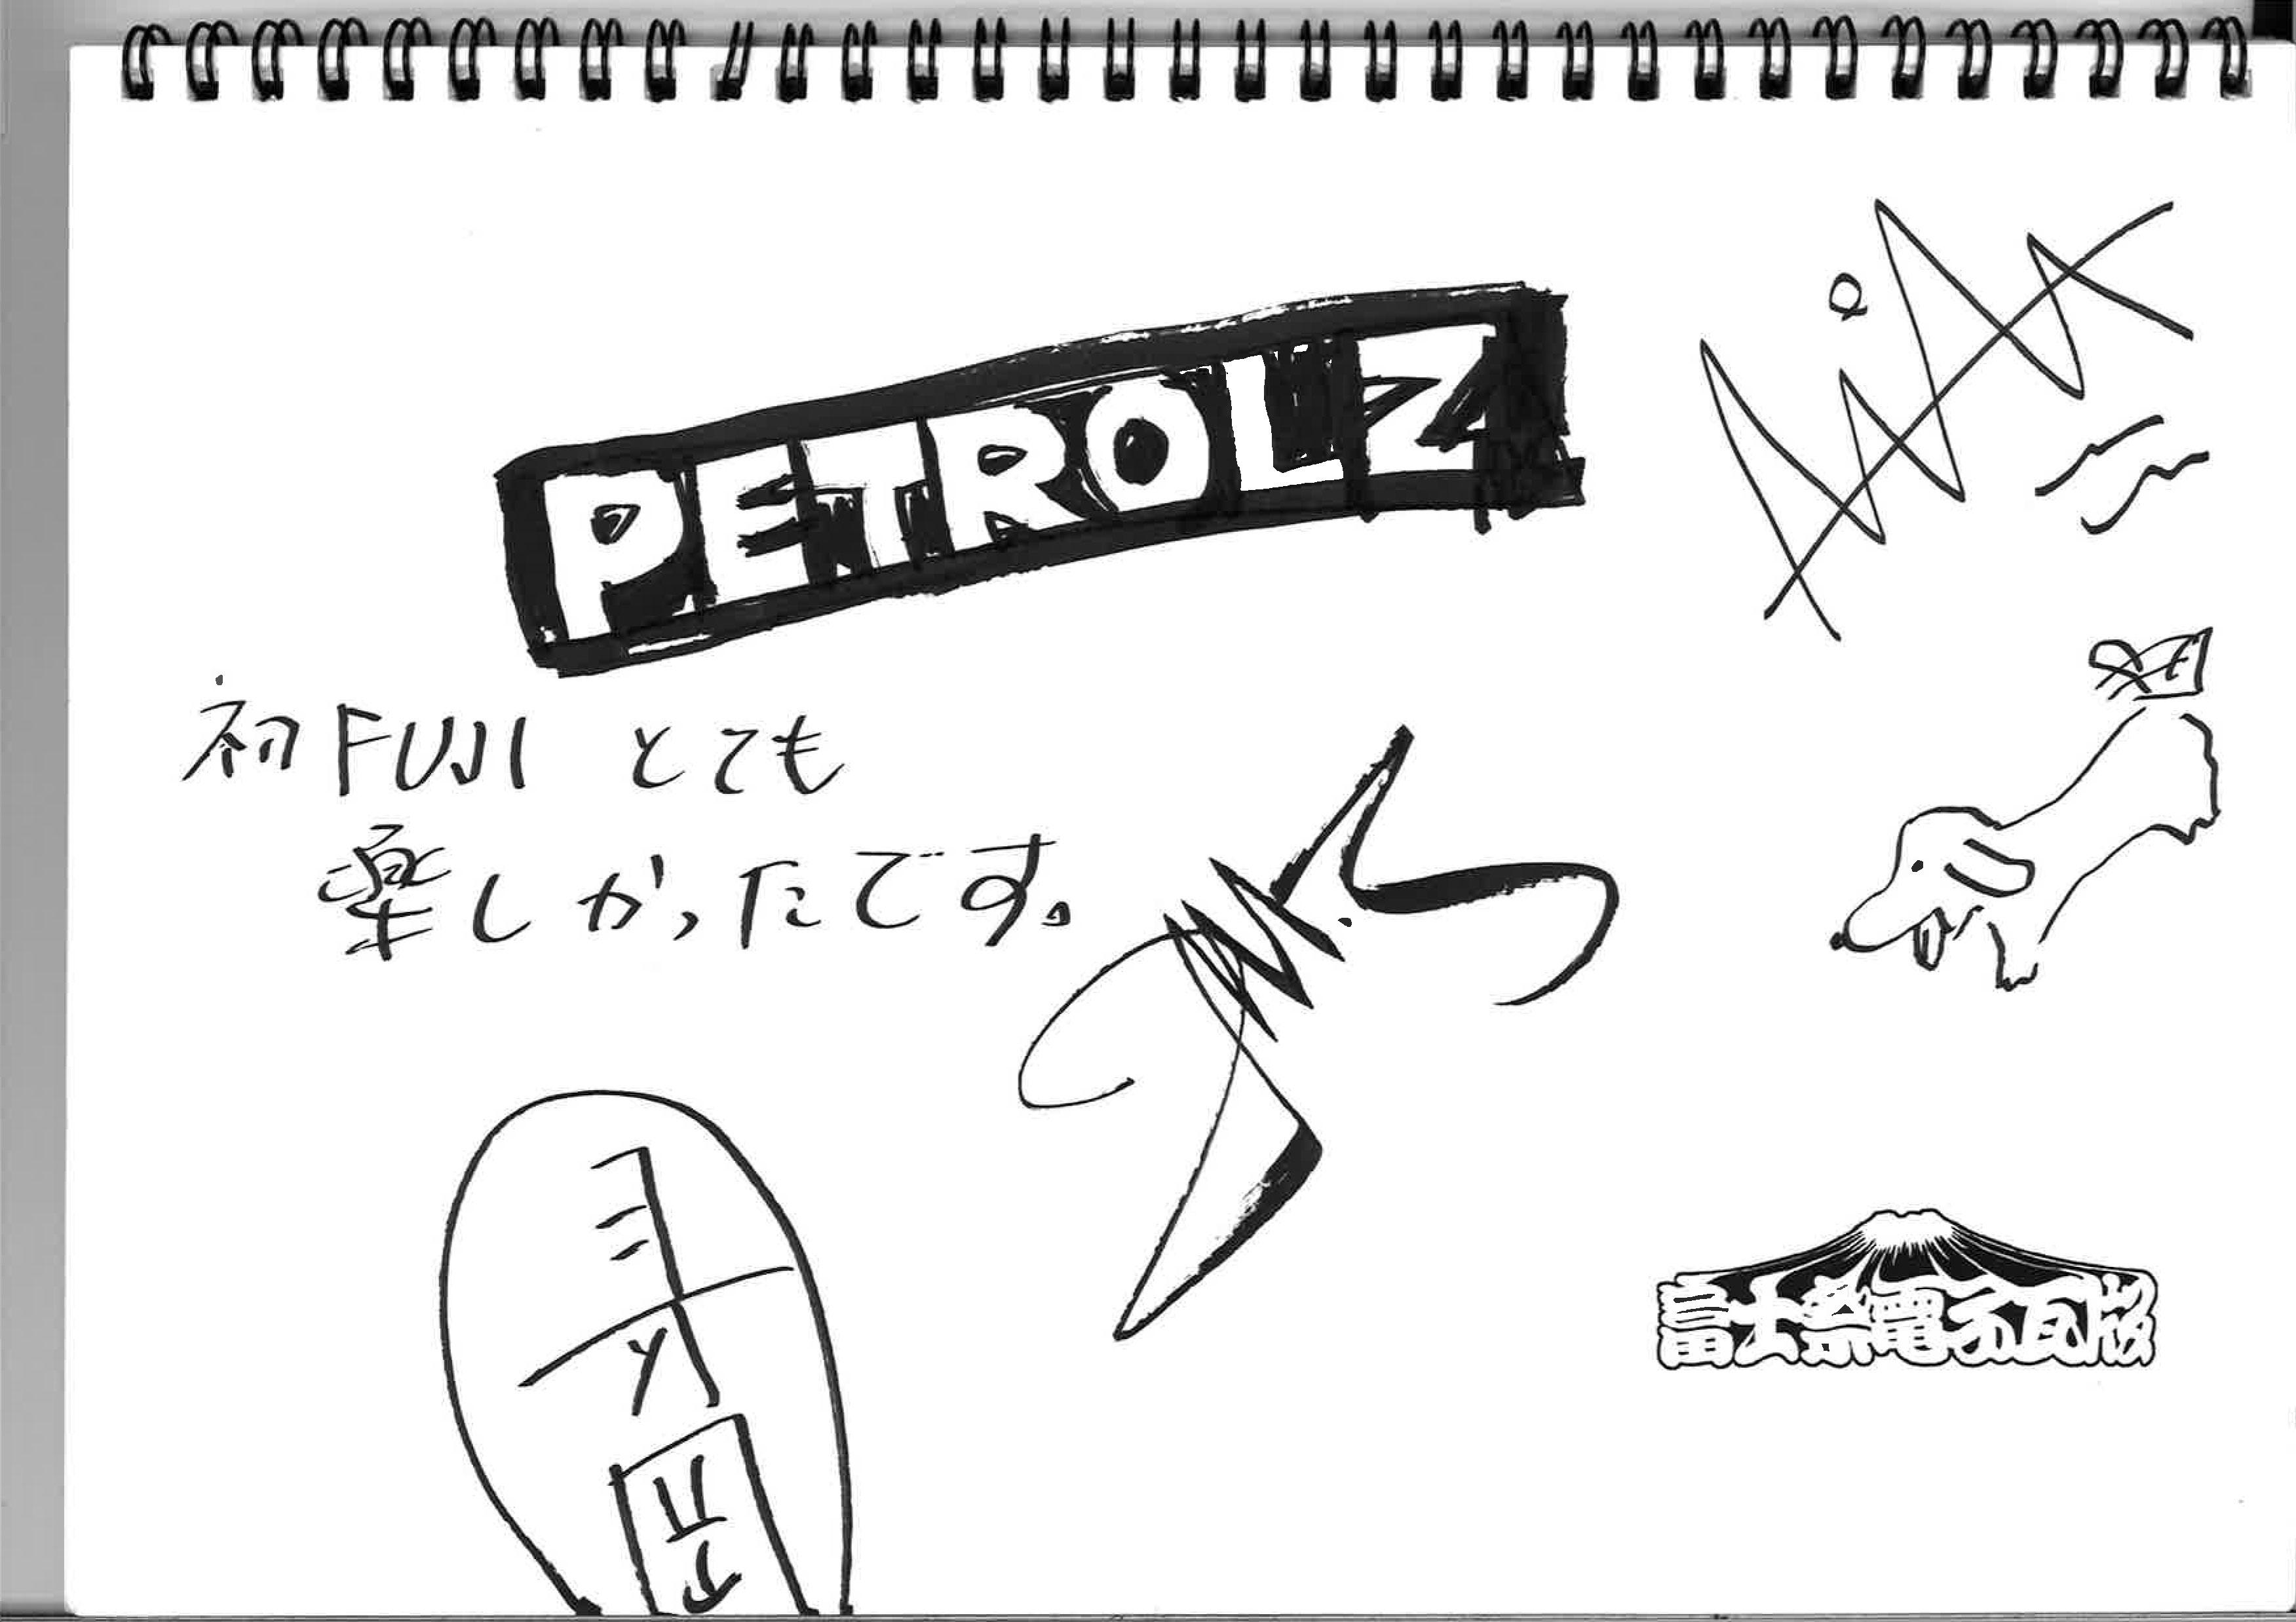 PETROLZ フジロック会場で発⾒!有名人フォトスナップ【前夜祭&1 ⽇⽬】